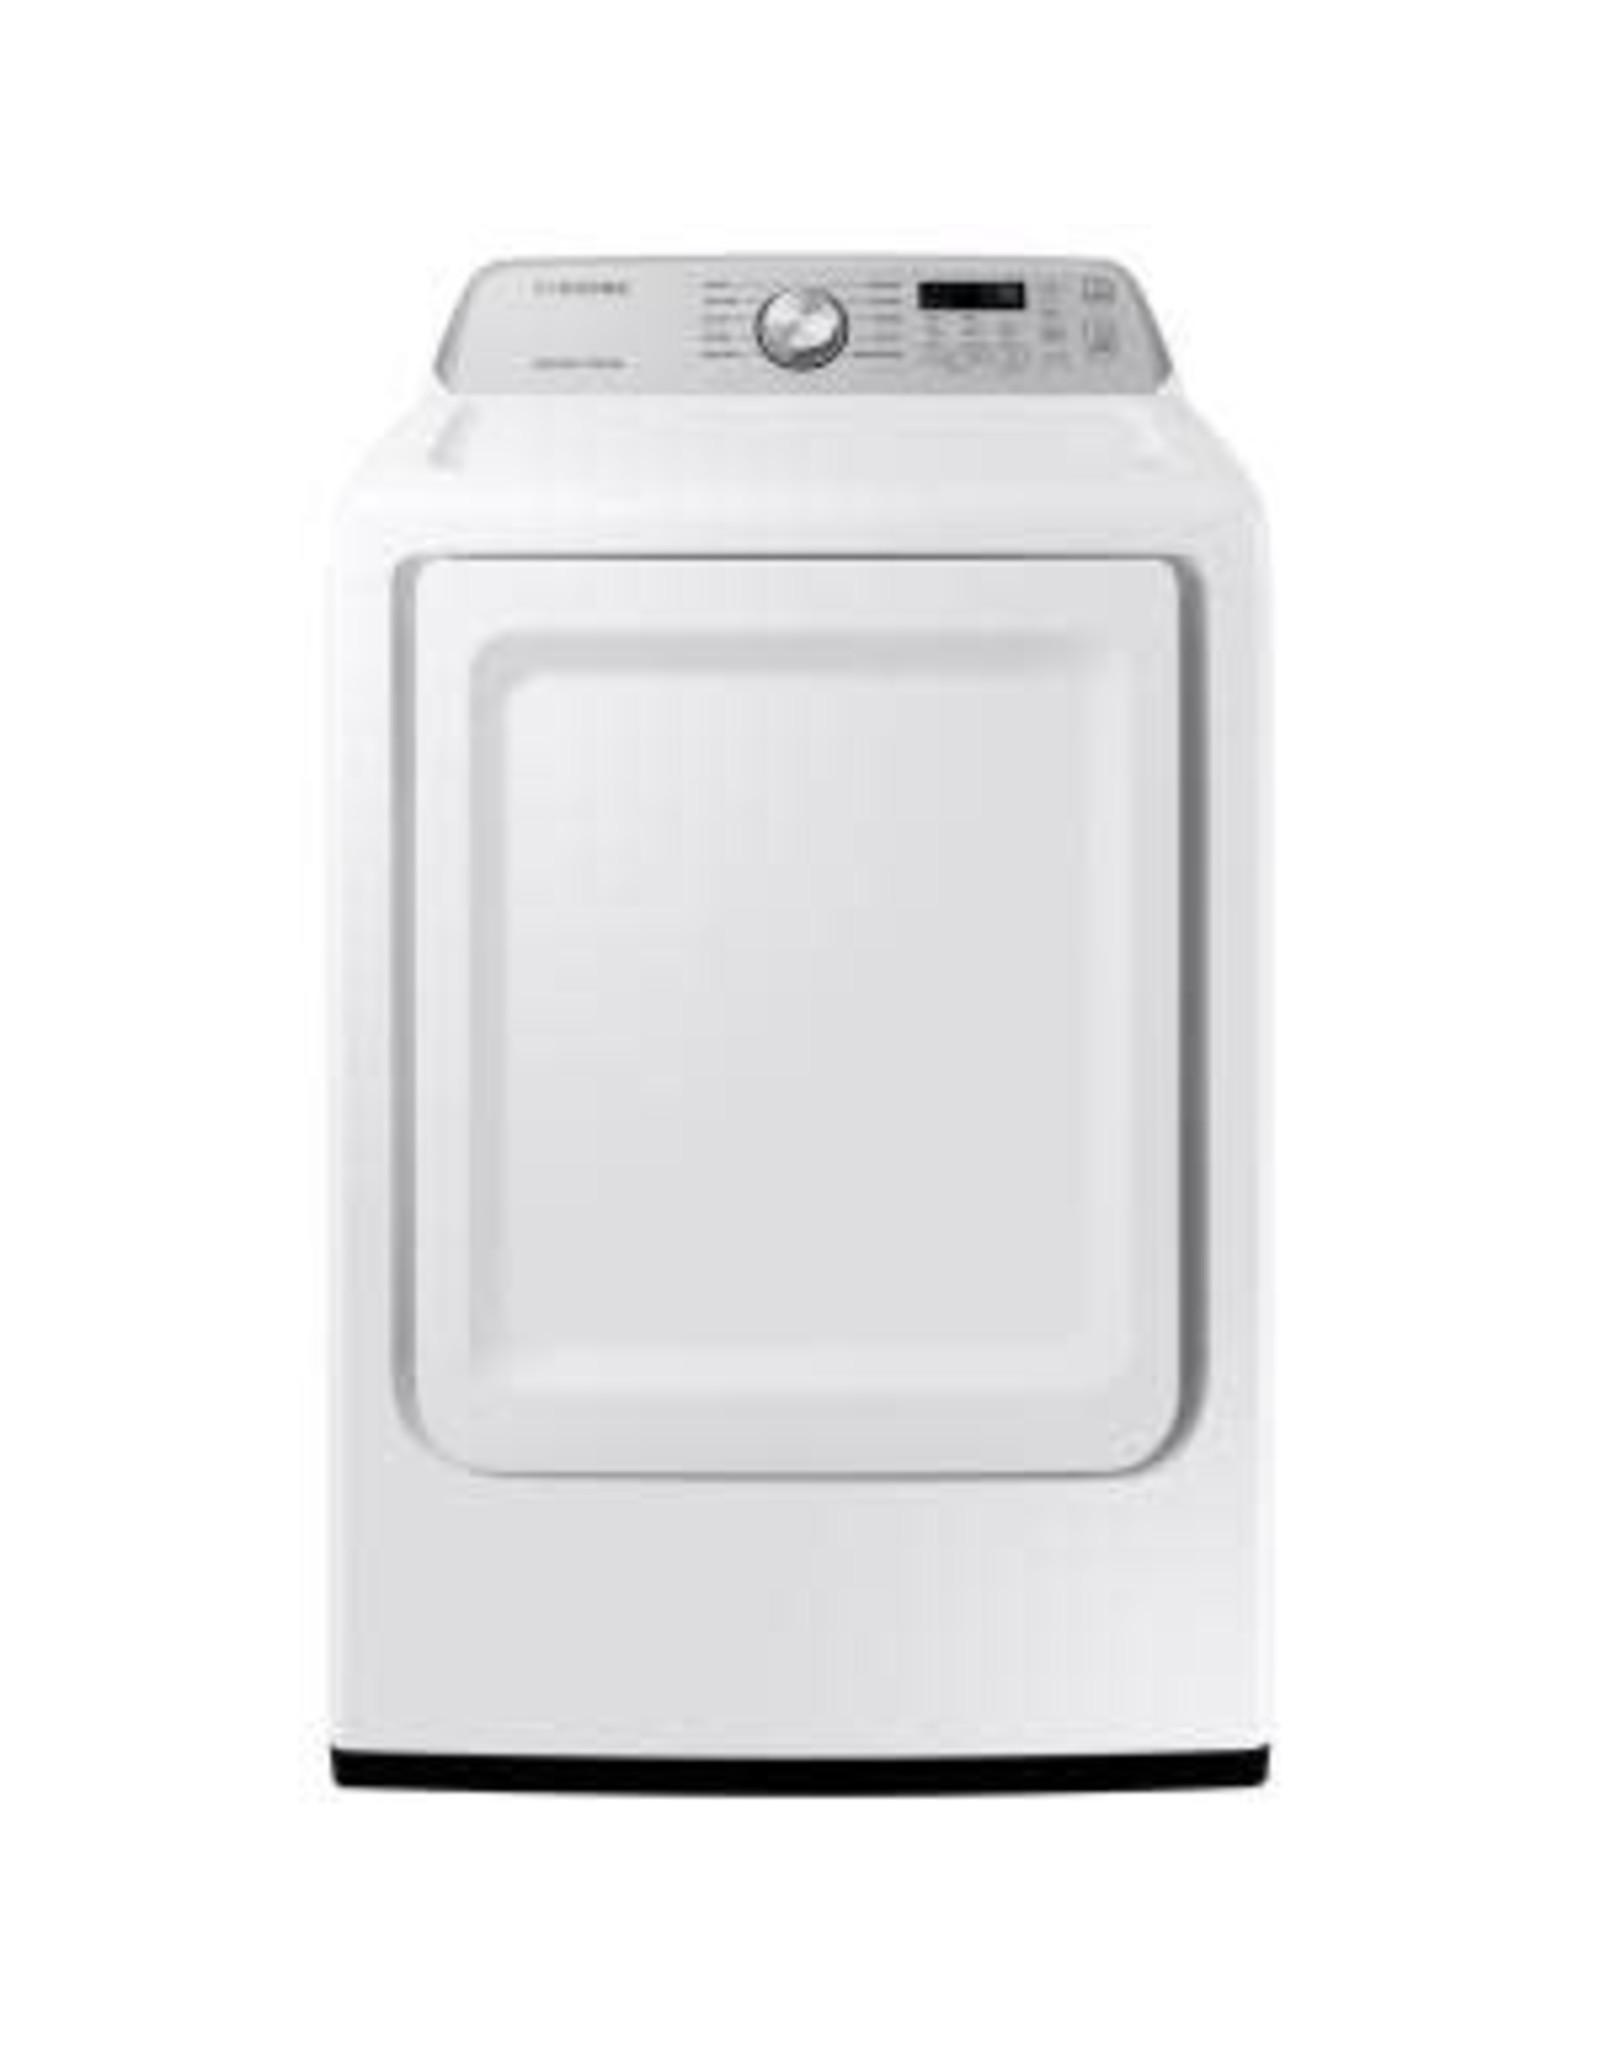 SAMSUNG DVG45T3400W 7.4 cu. ft. 120-Volt White Gas Dryer with Sensor Dry